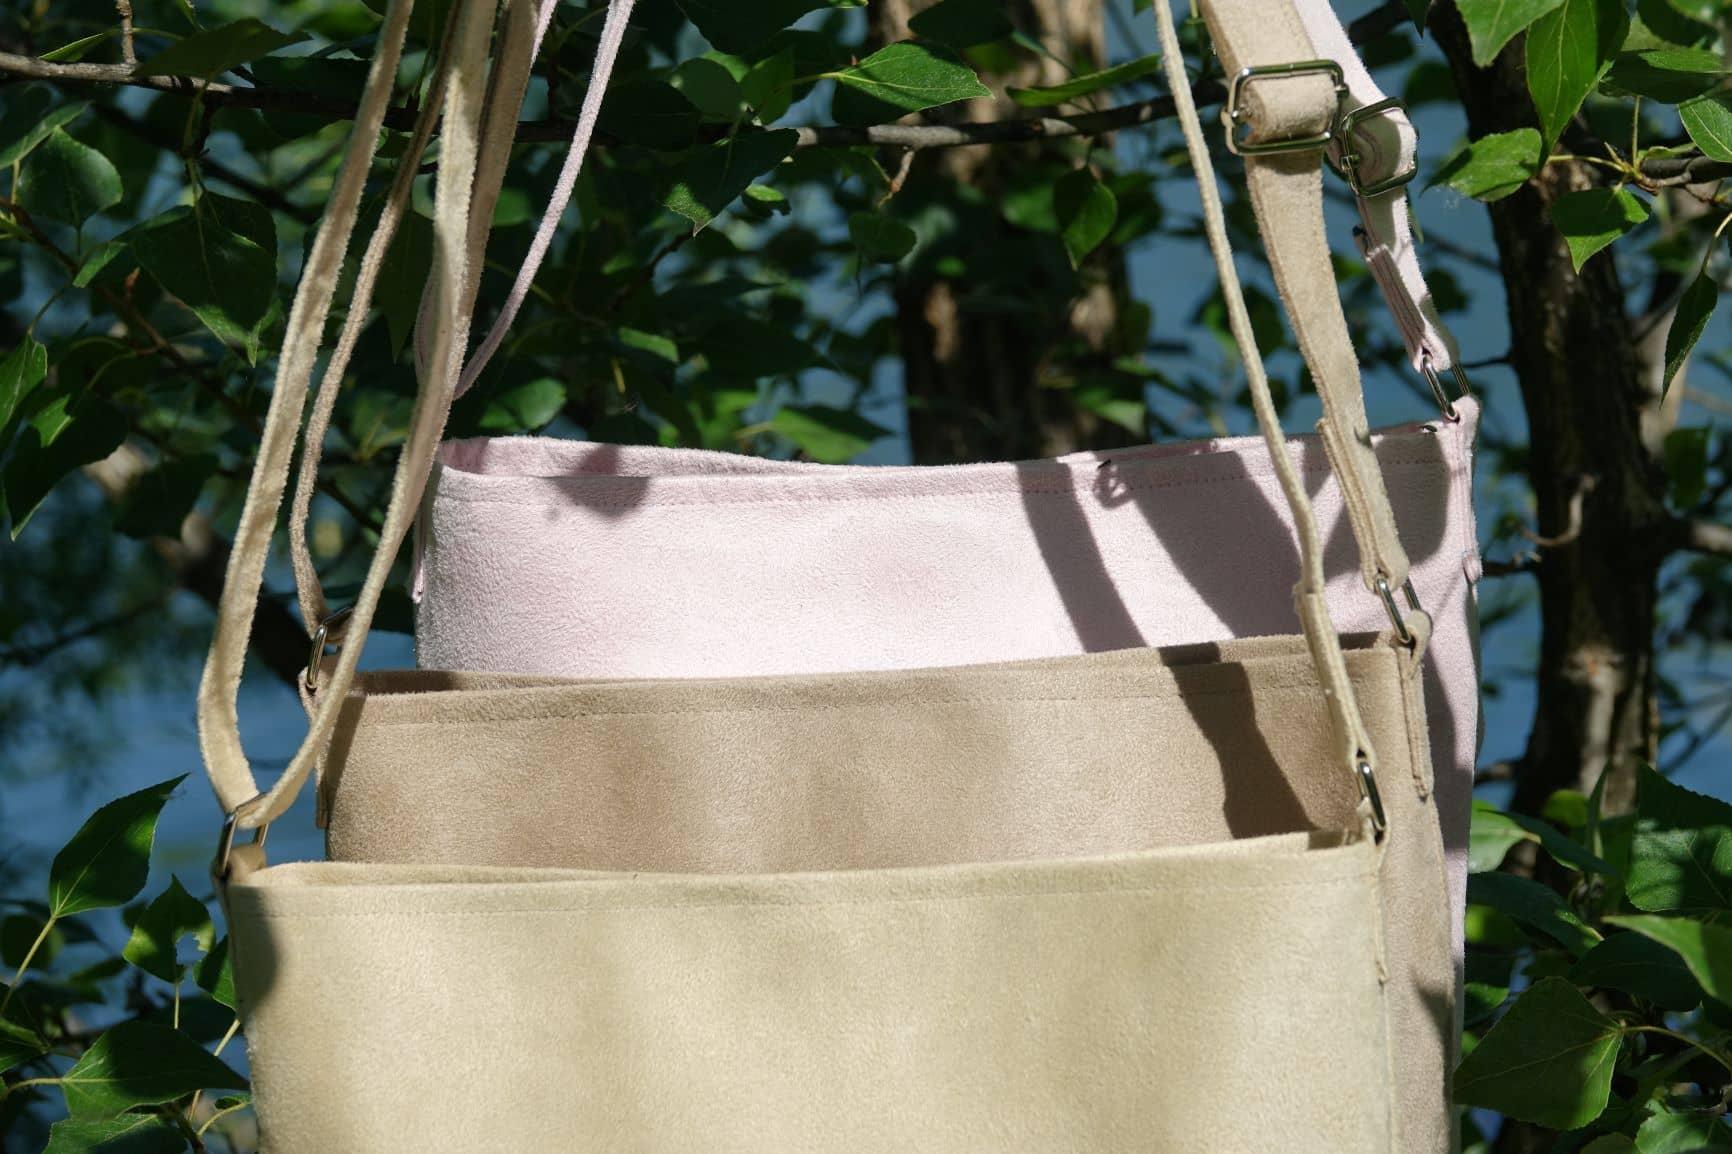 sac bandouliere suedine aloée